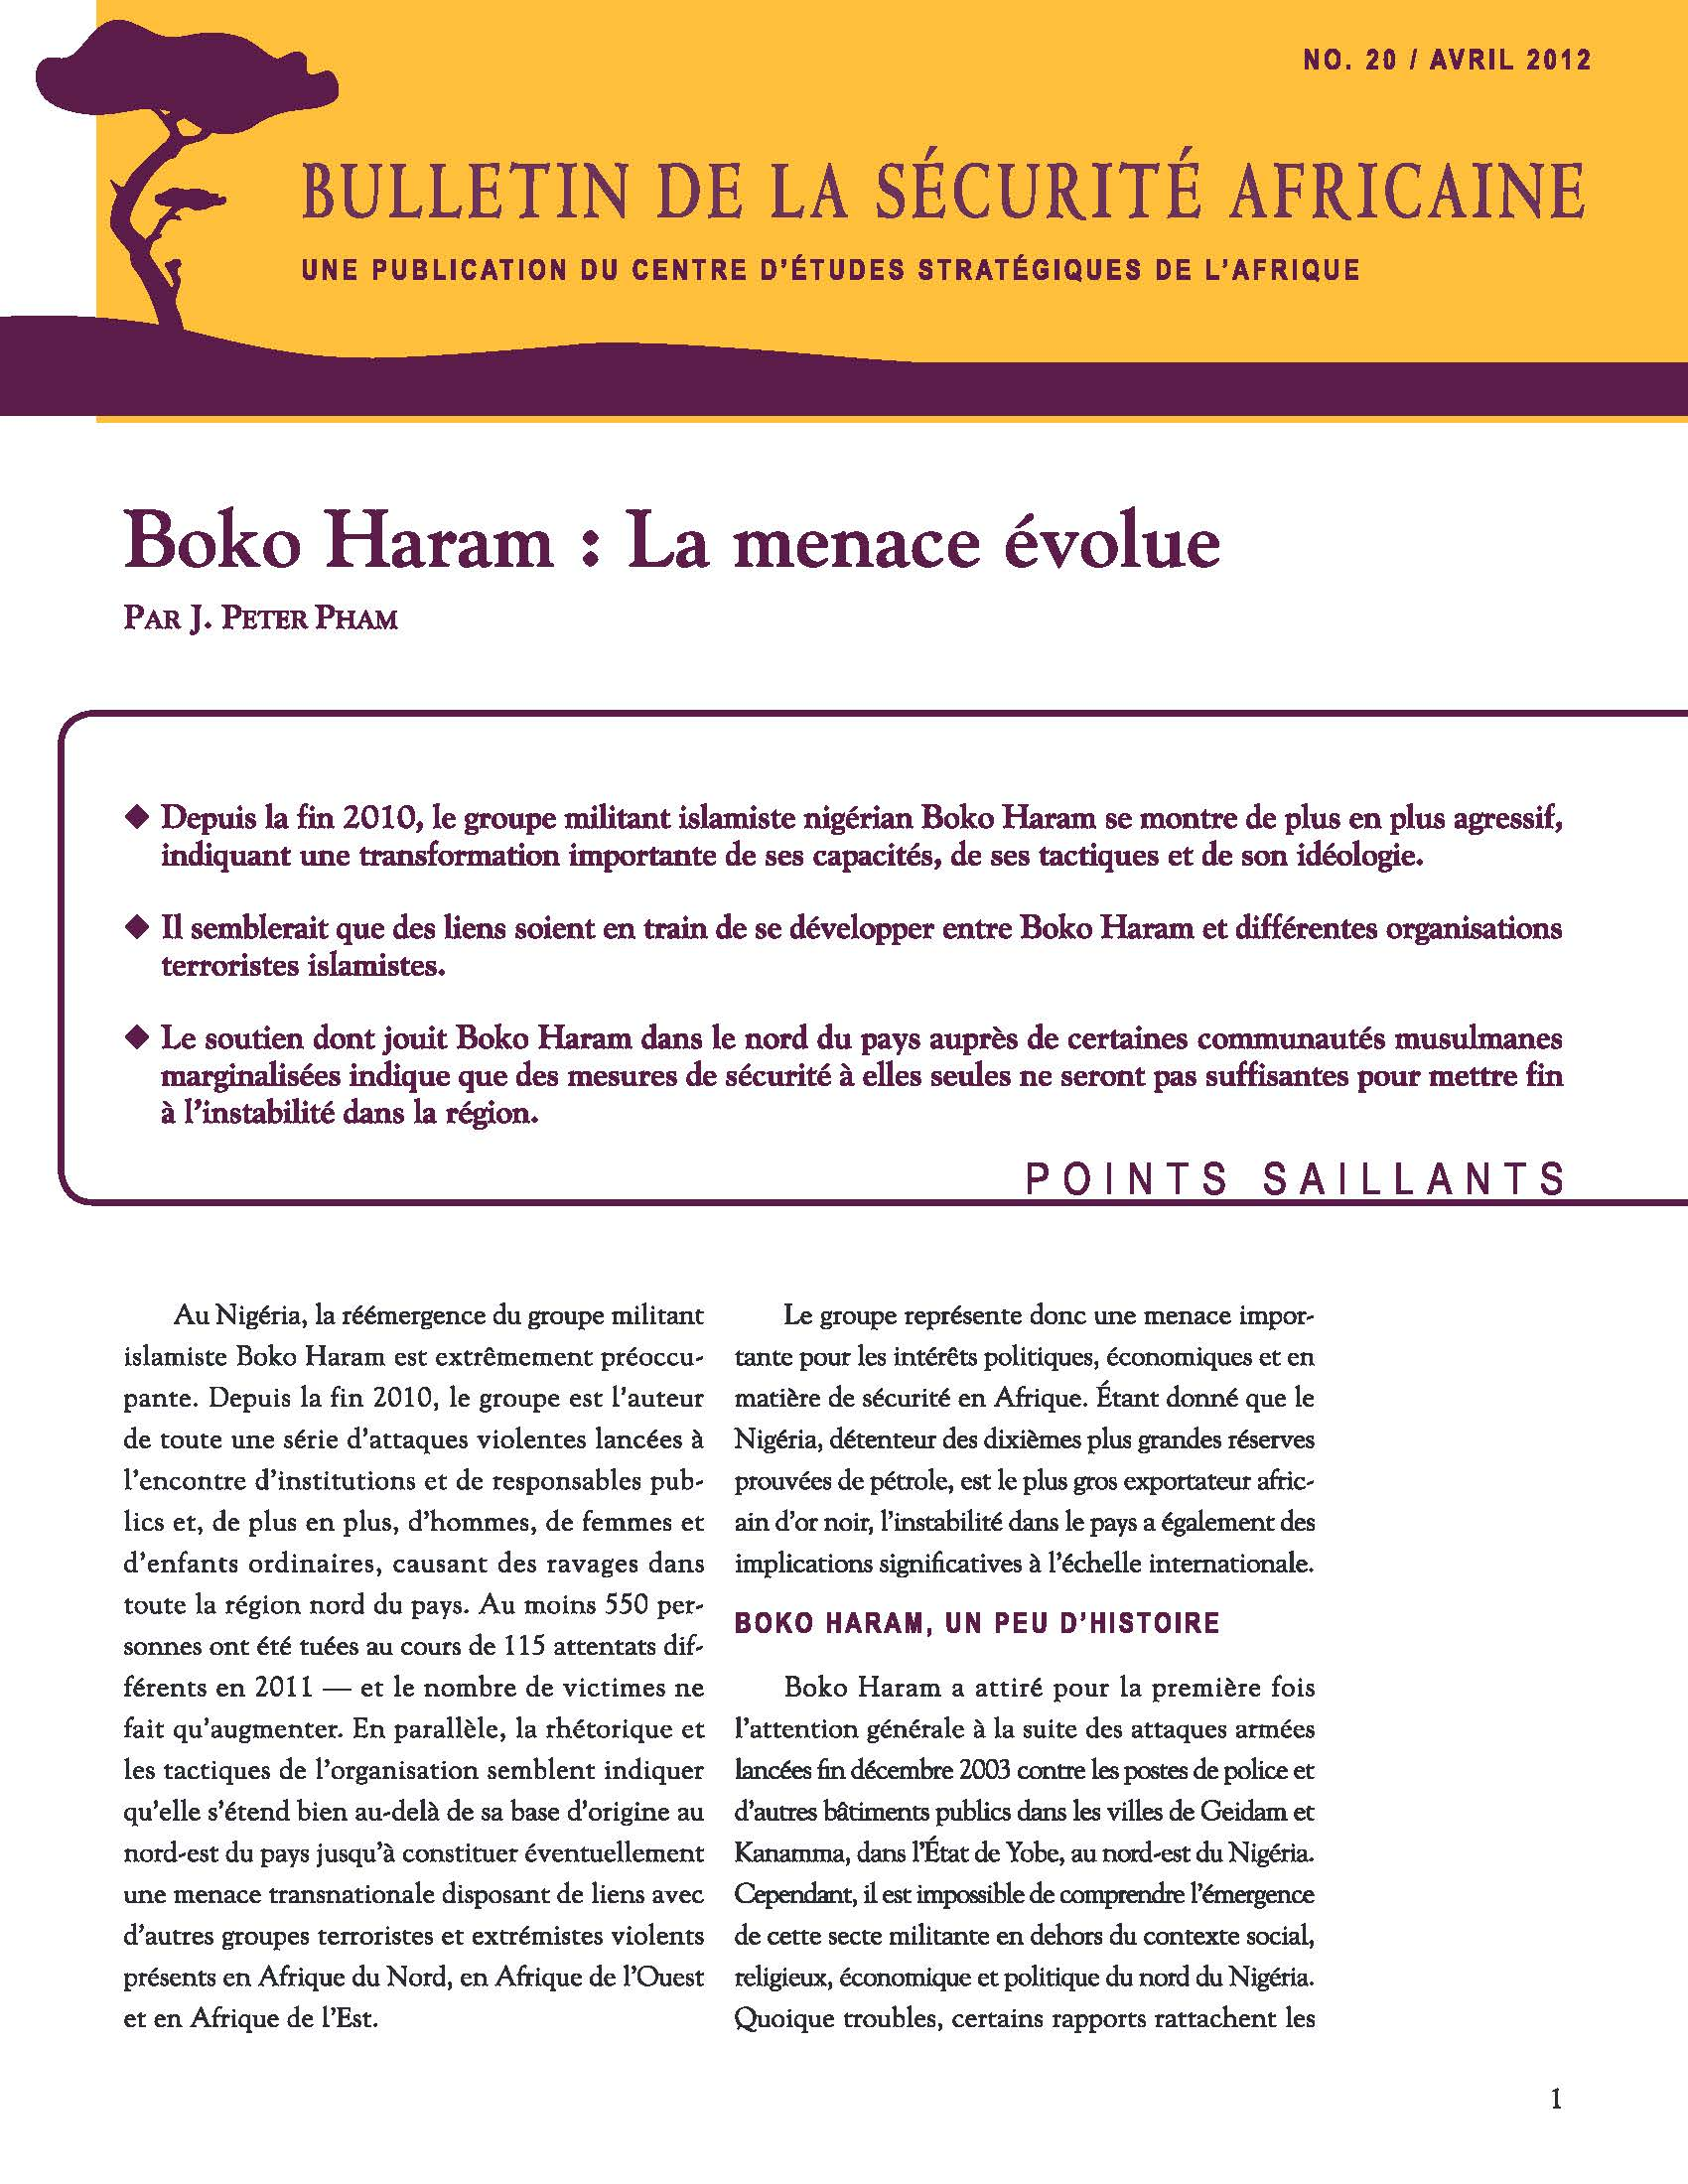 Africa-Security-Brief-No.-20-FR page 1